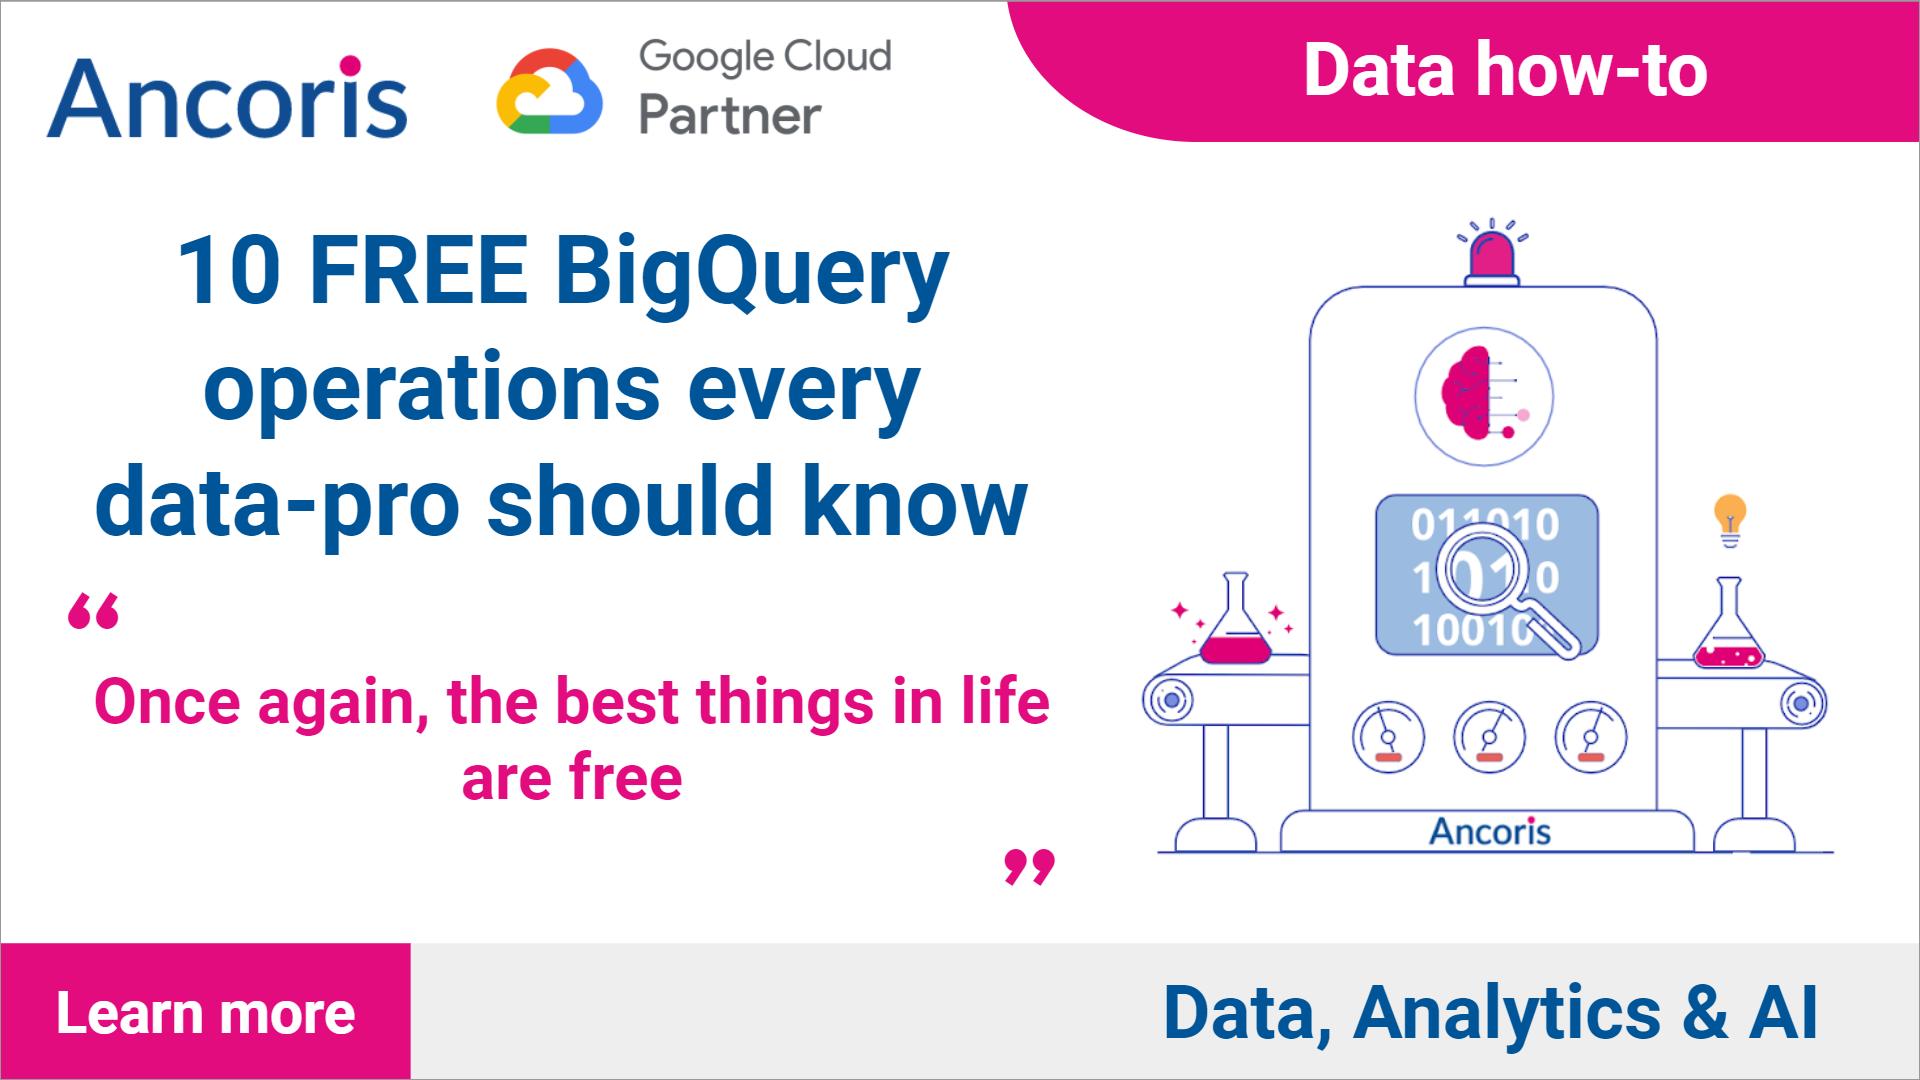 Biguery_free_operations